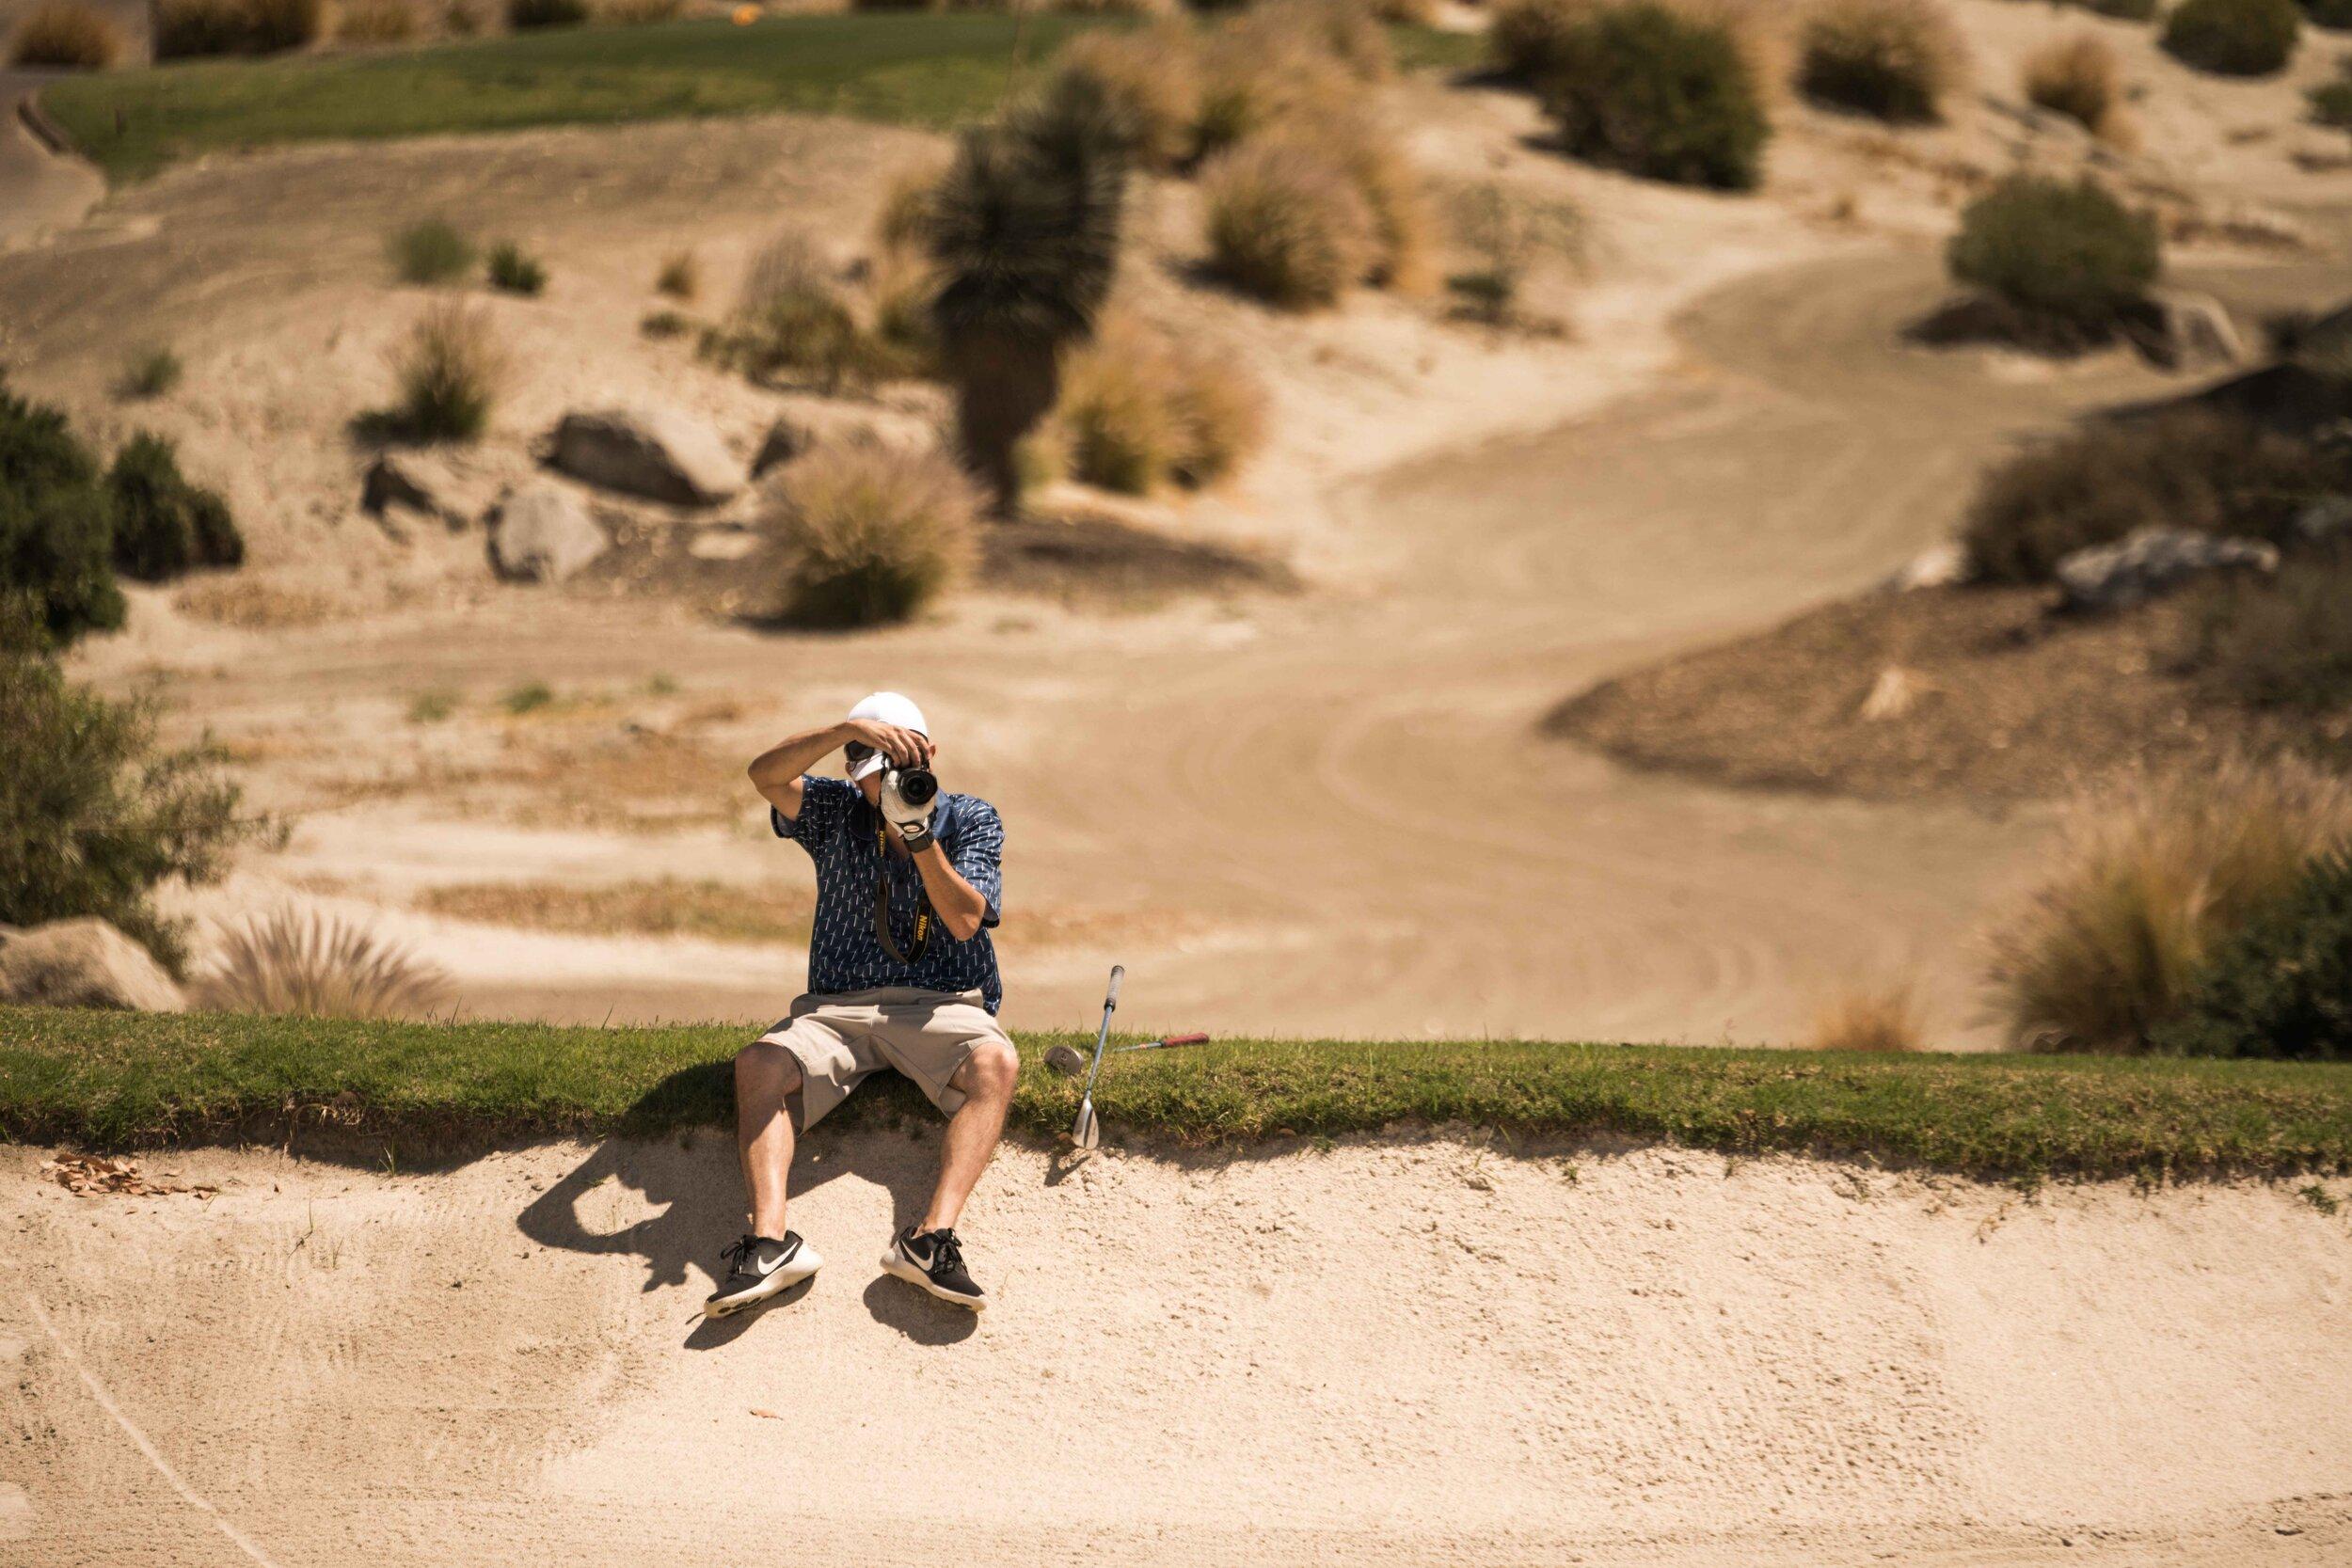 Fernando Rodriguez, AKA  The Desert Golfer  finds the perfect photo perch.